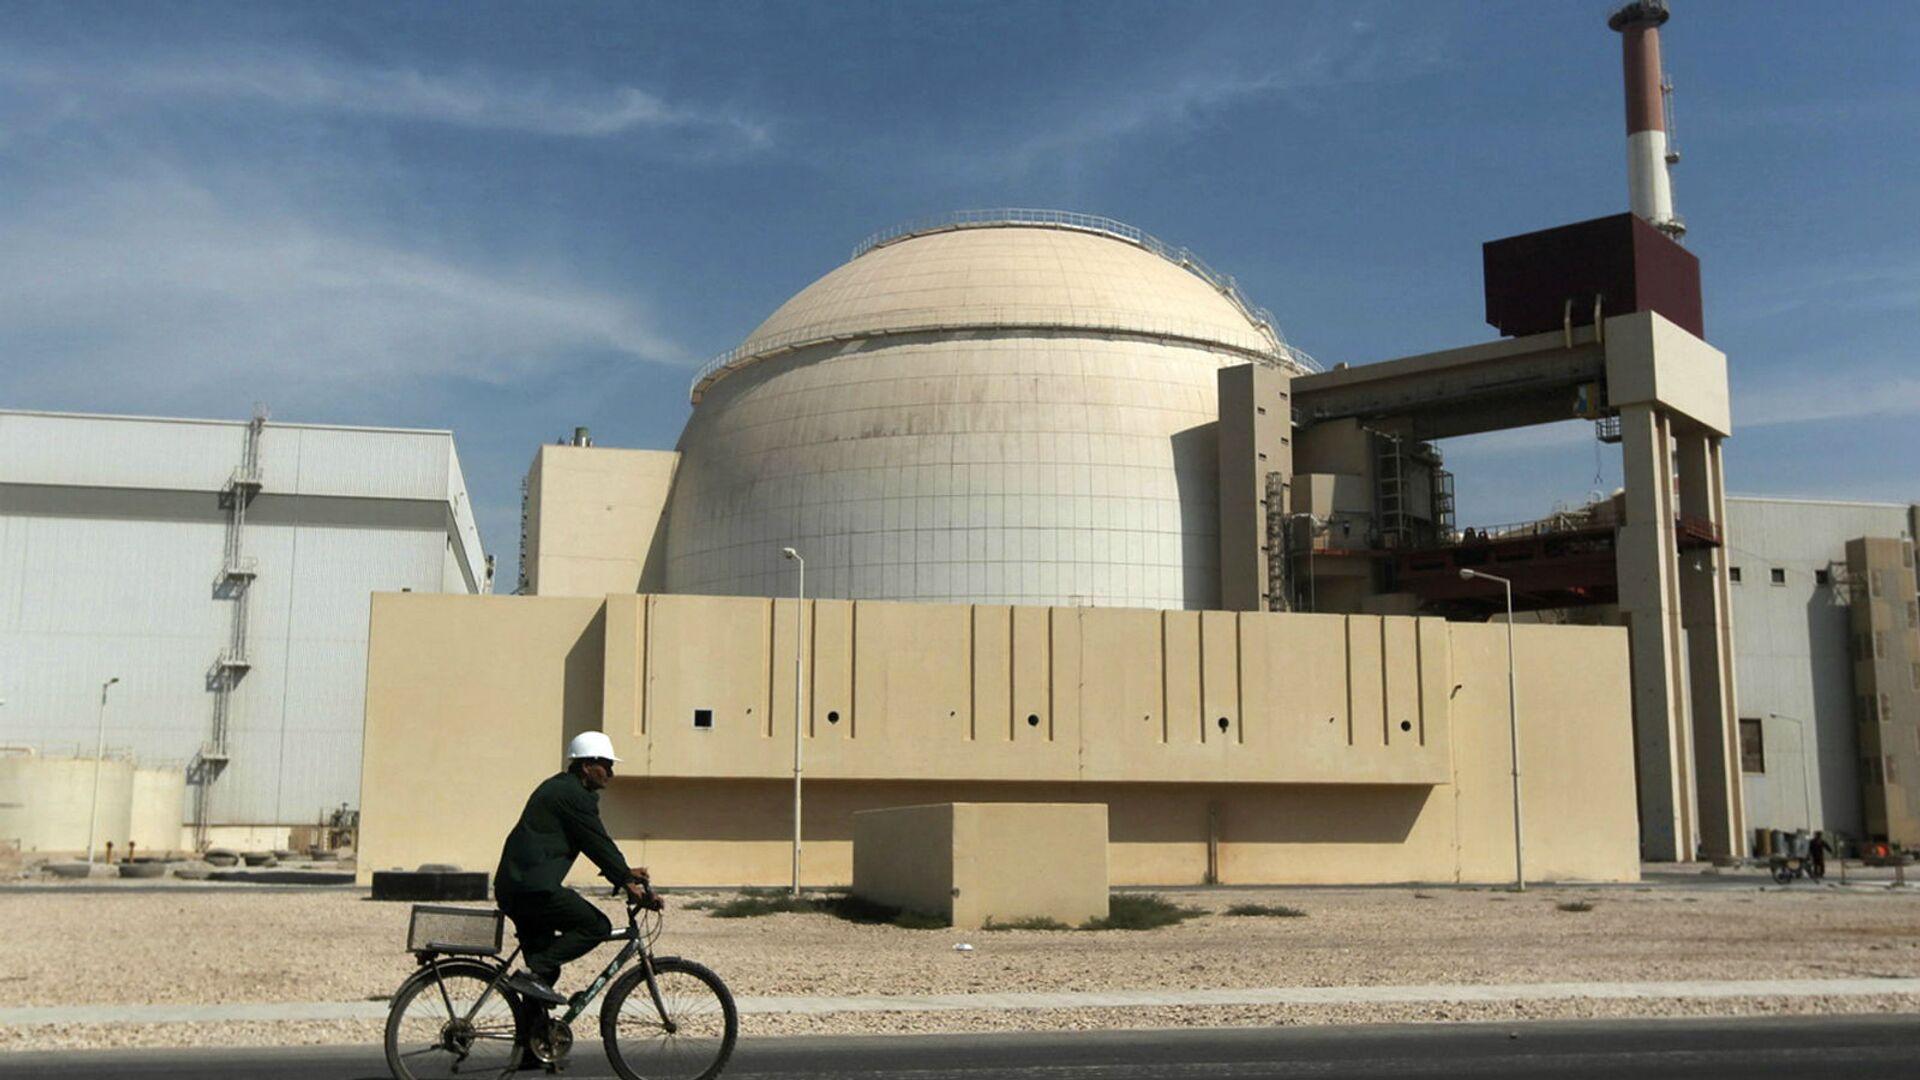 Здание реактора АЭС Бушер (26 октября 2010). Иран - Sputnik Արմենիա, 1920, 19.09.2021